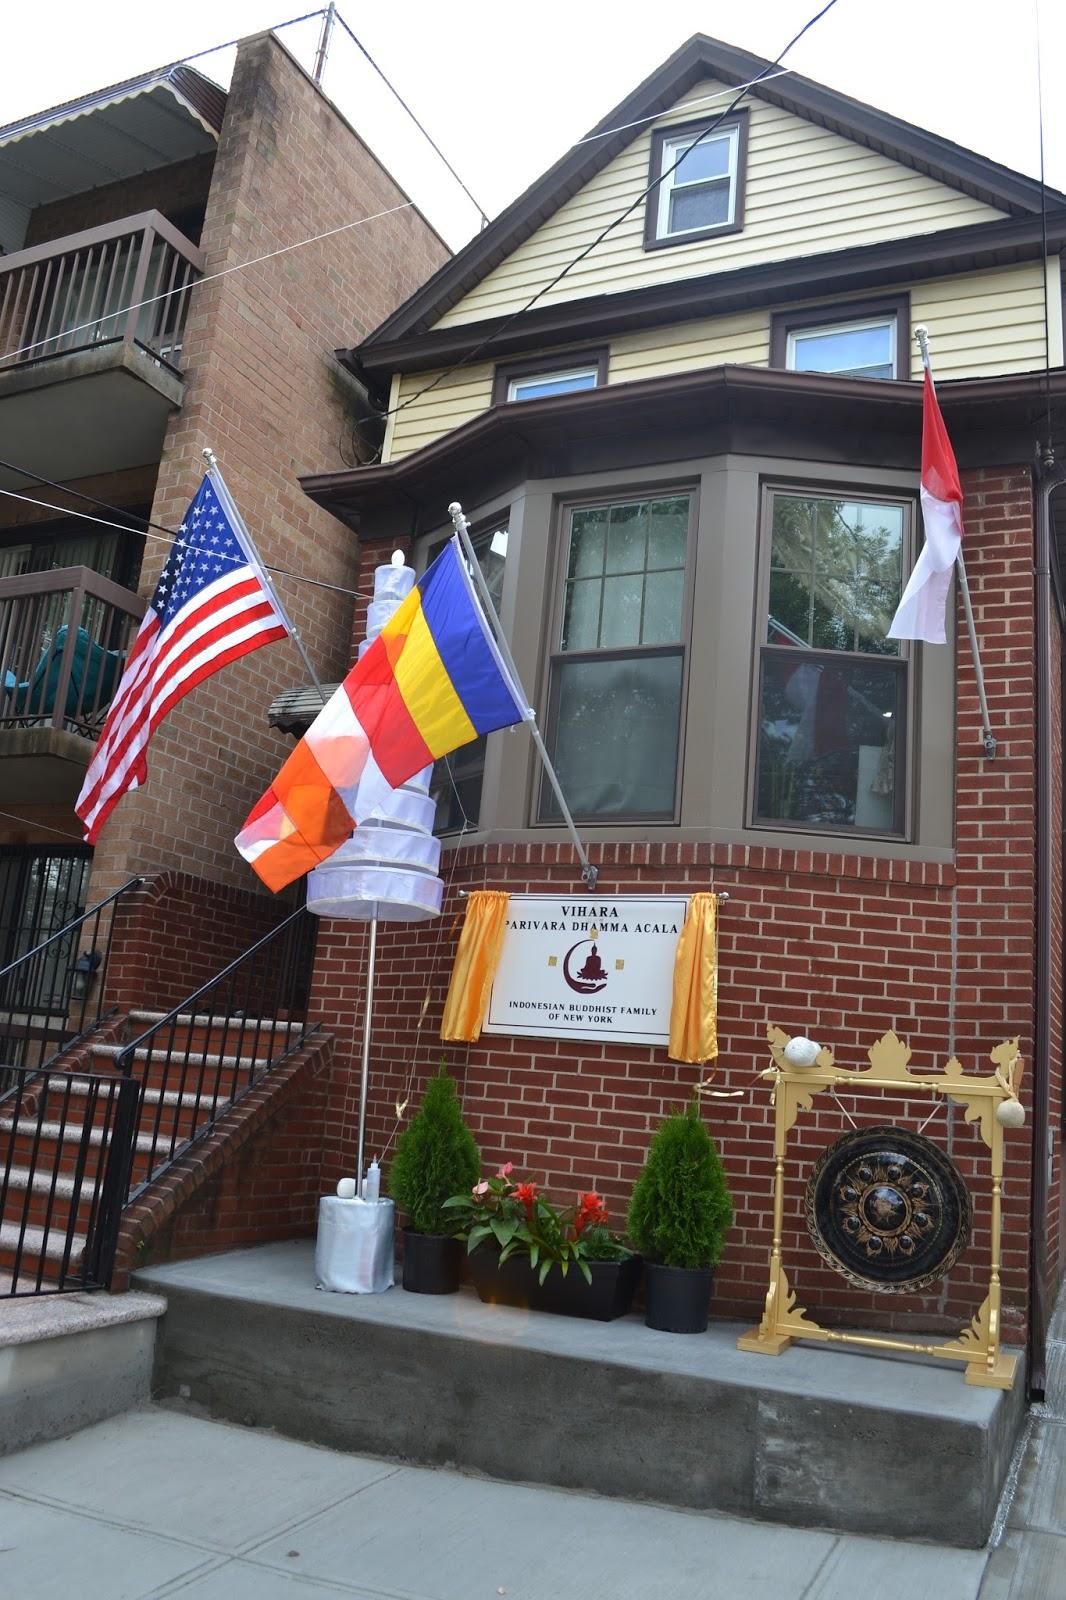 Vihara Parivara Dhamma Acala, New York, Amerika Serikat